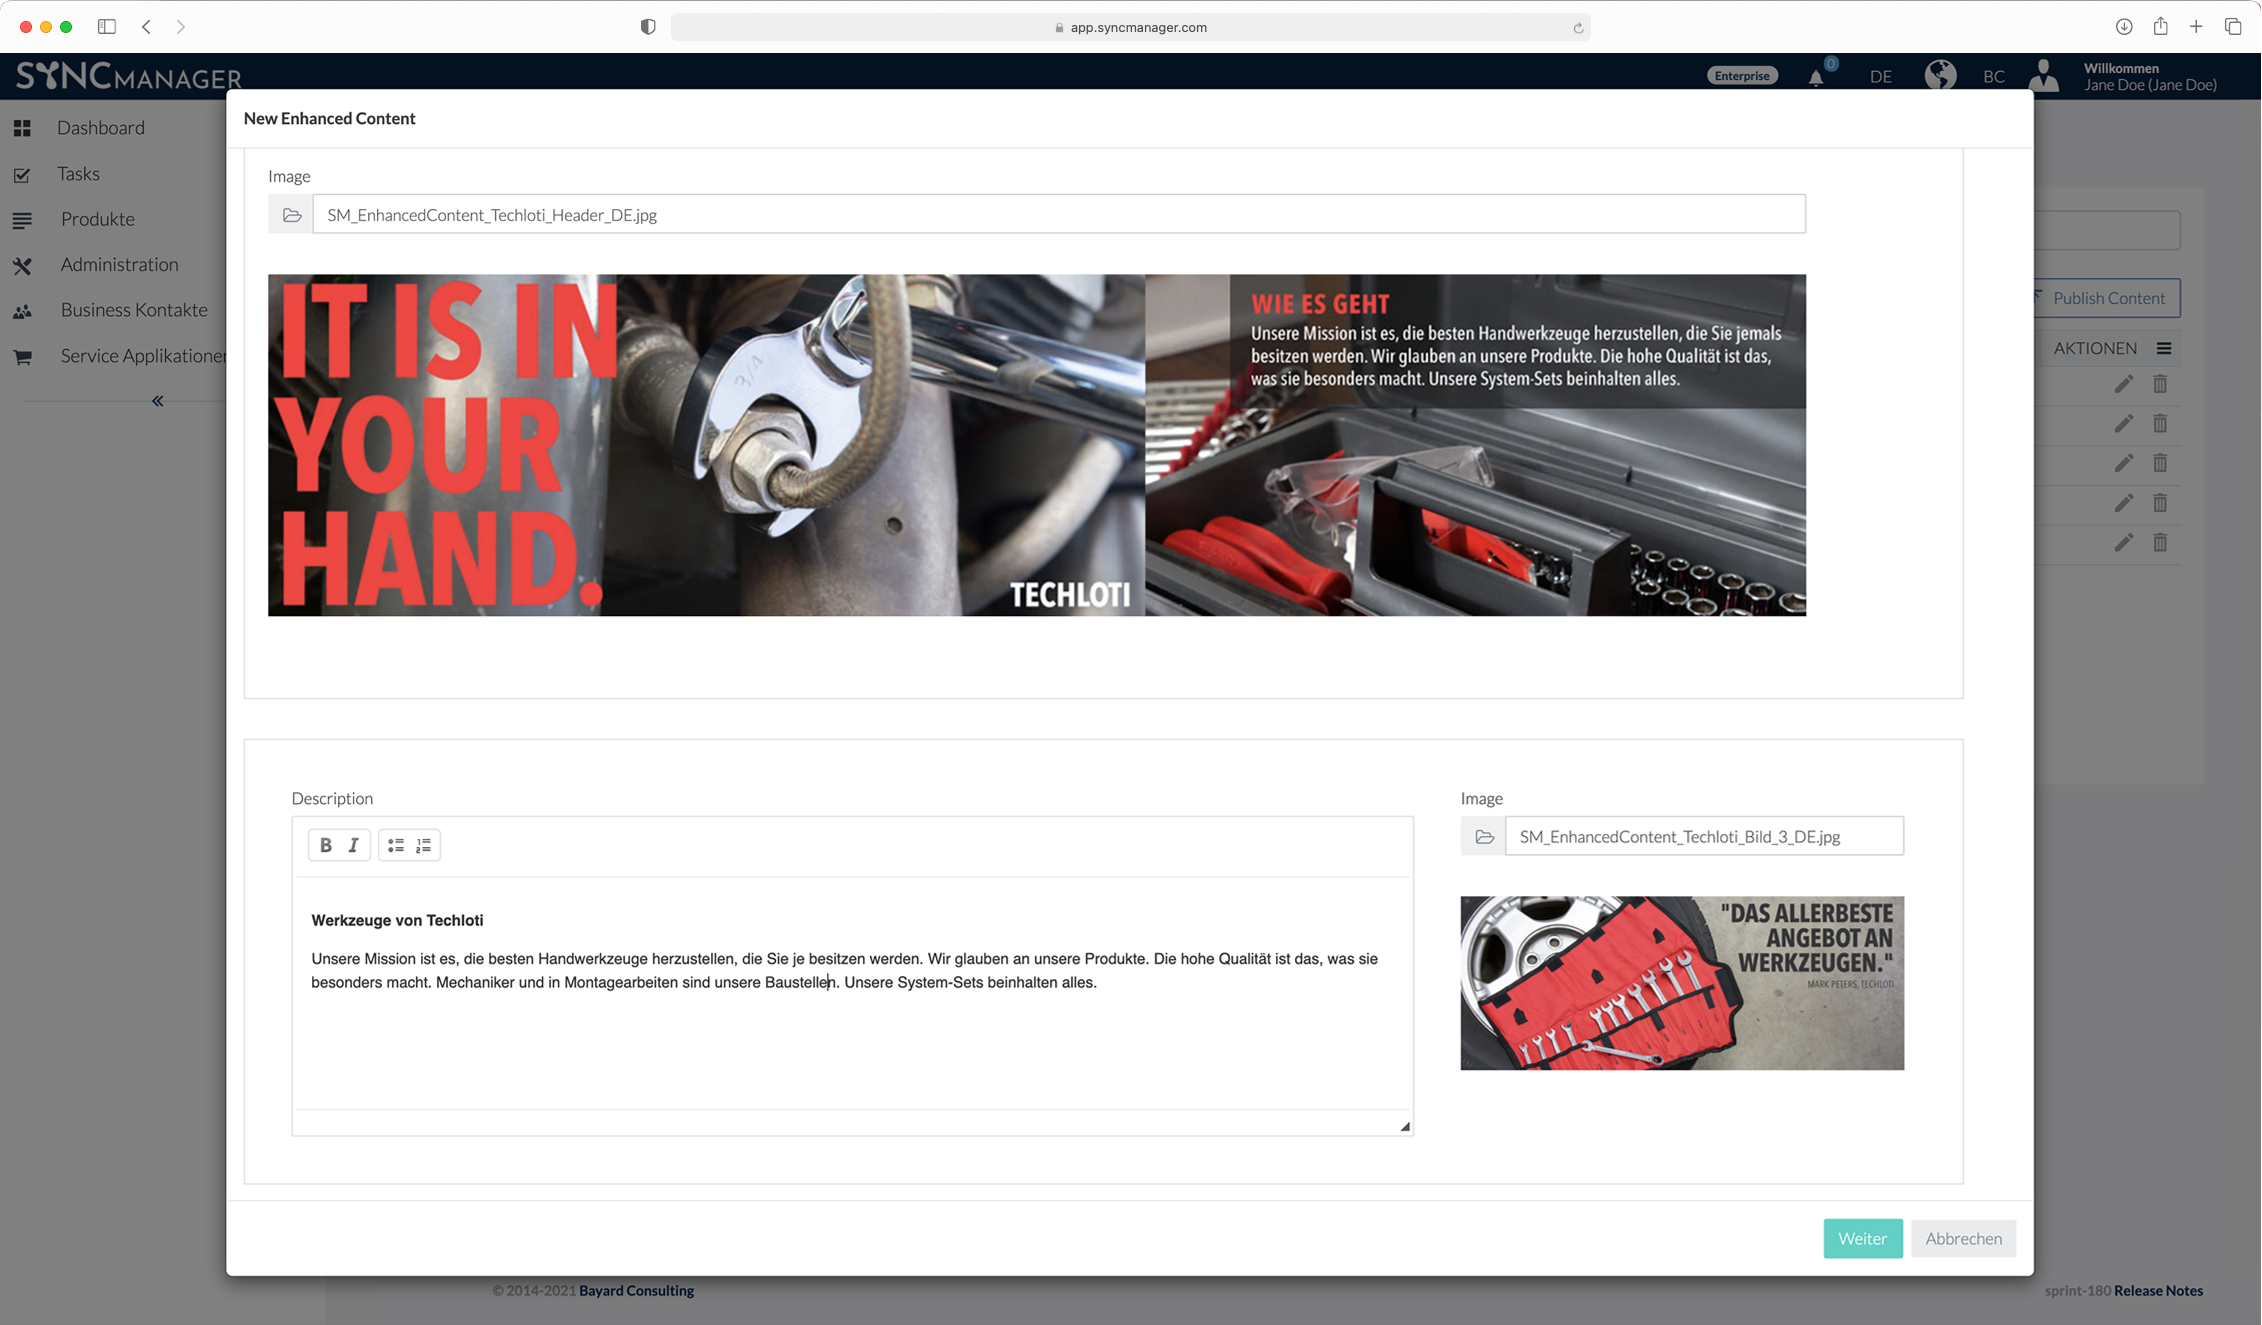 SyncManager – Produkt-Webshop-Detailseiten für Lieferanten – Enhanced Content – DIY –Editor